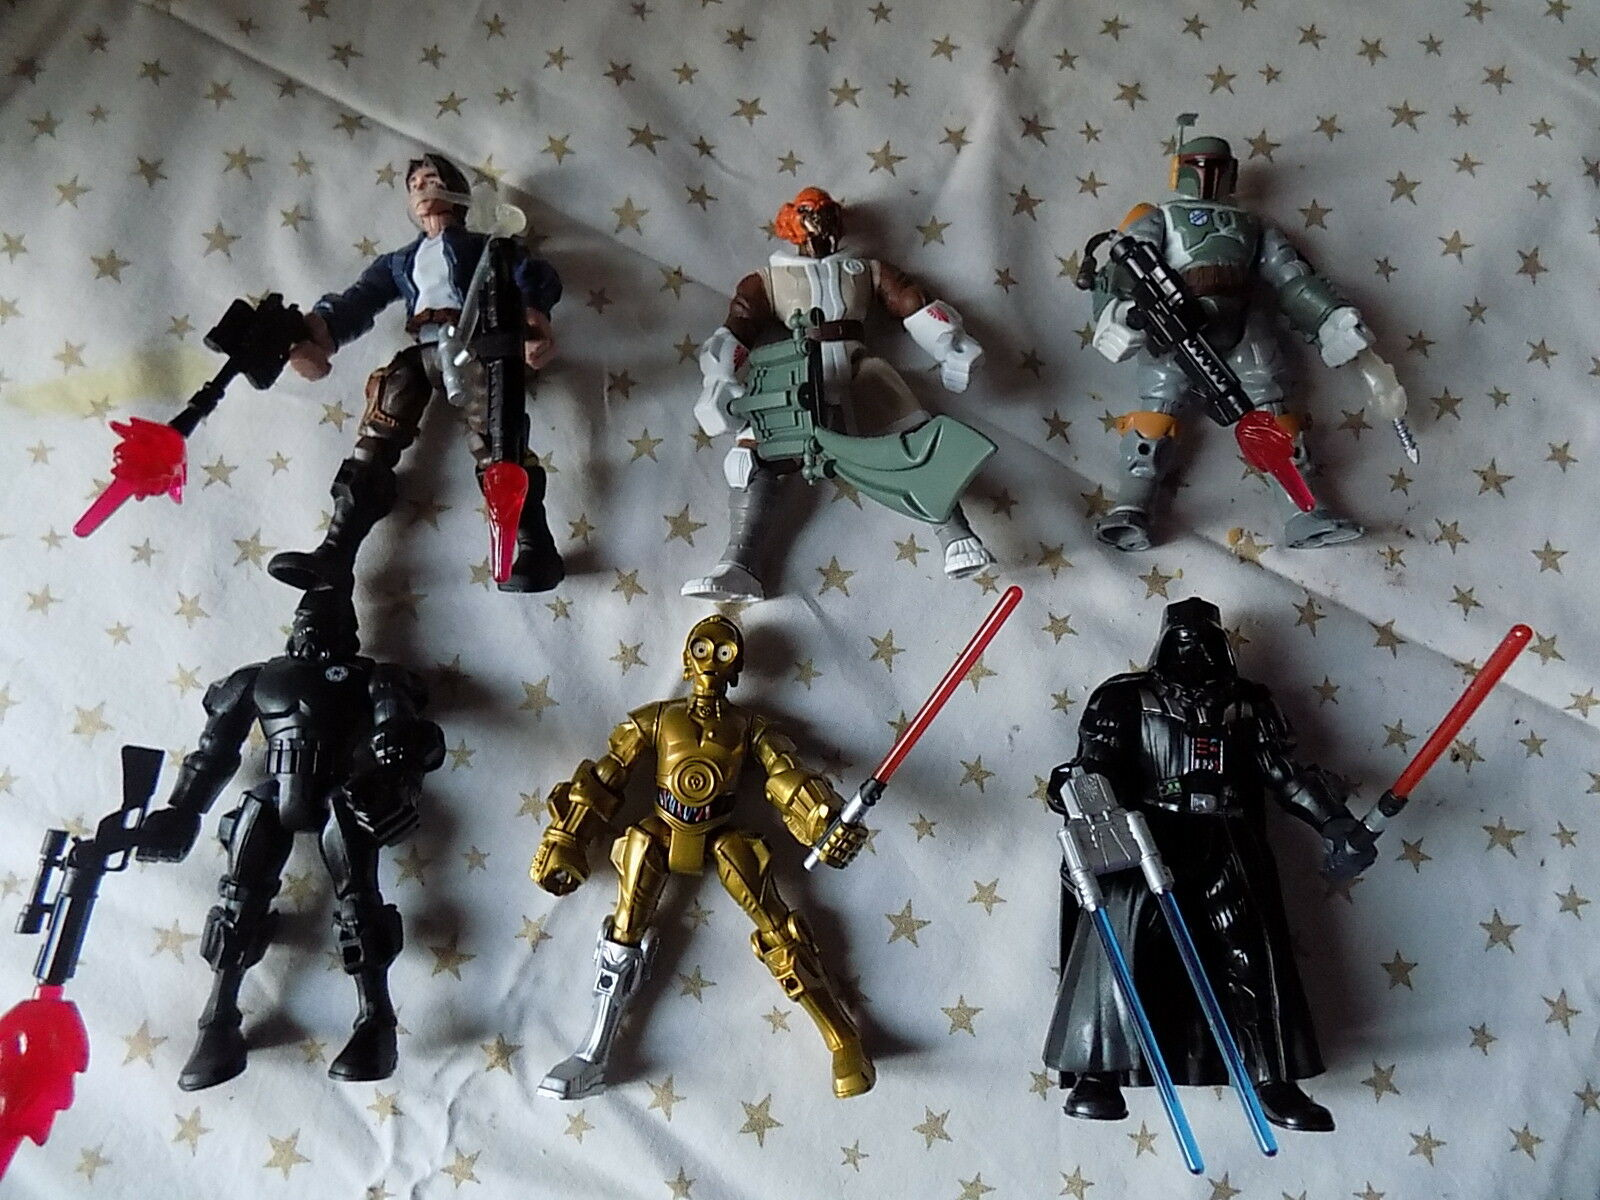 STAR WARS Collection Complète de SEPT figurines STAR WARS + 13 accessoires NEUFS